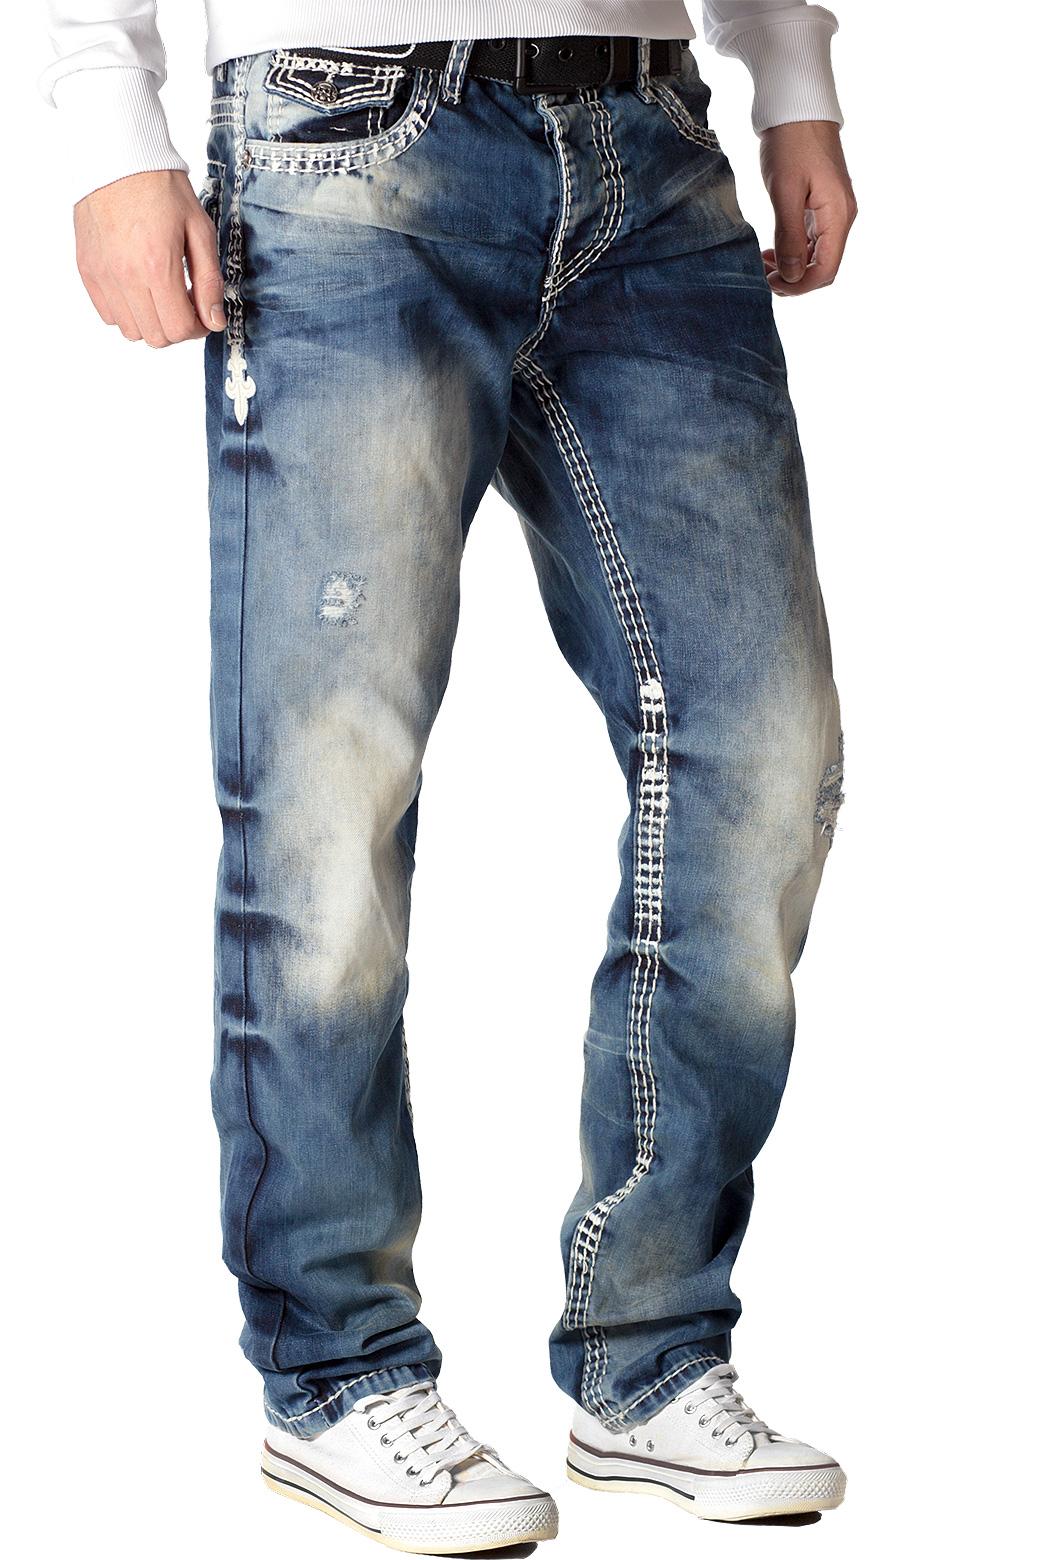 Cipo-amp-Baxx-Uomo-Jeans-Pantaloni-ricamate-Biker-Style-streetwear-nervature-pattern-Dope miniatura 12